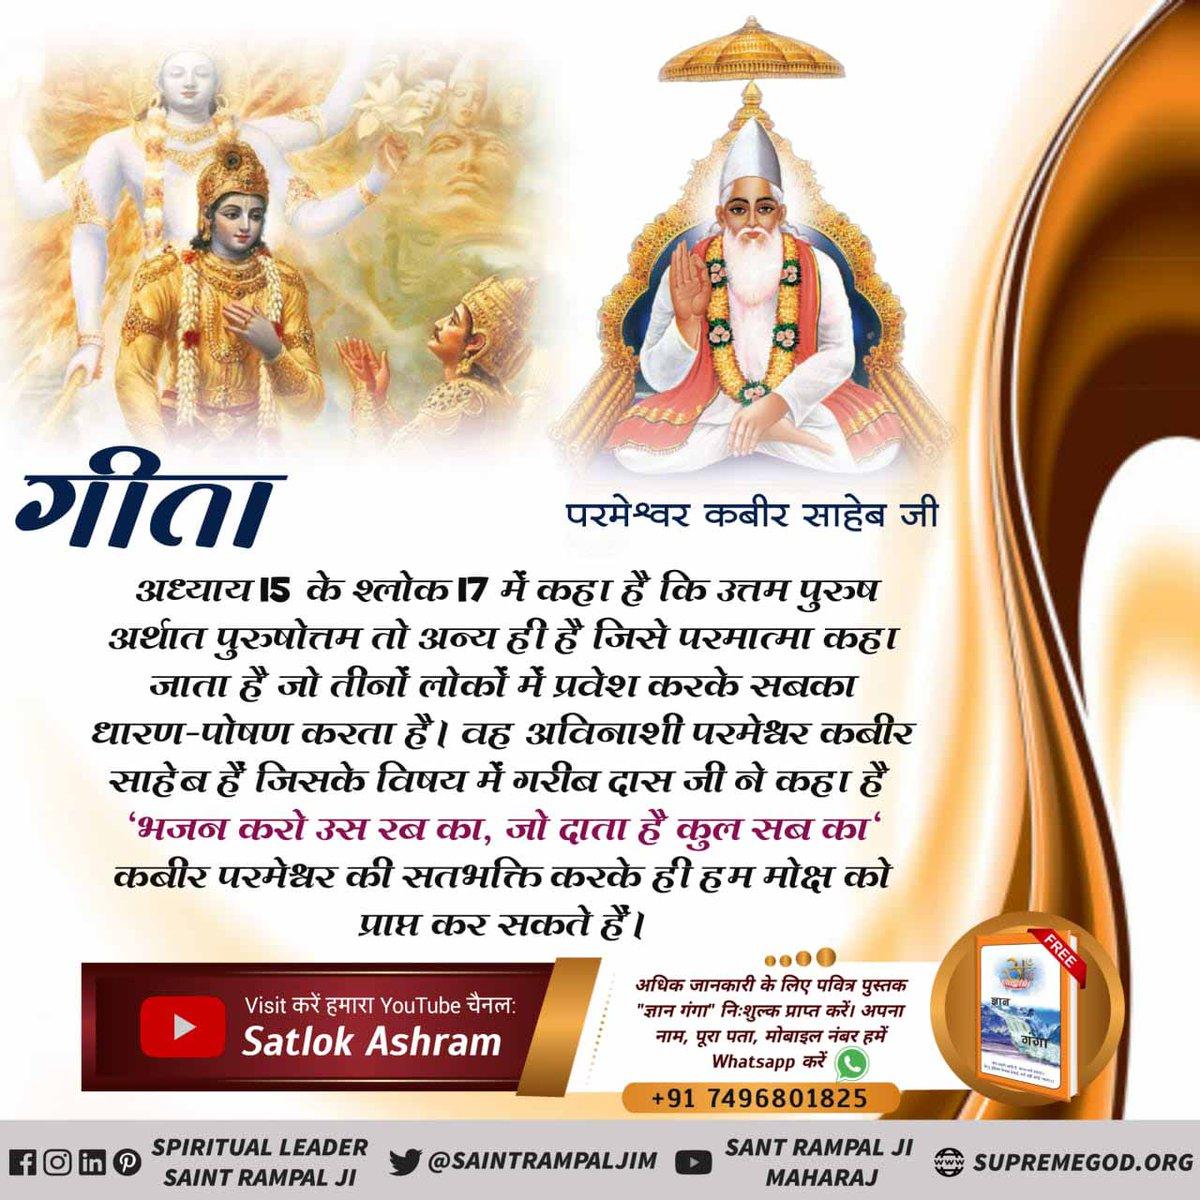 RT @SDDass12: #HowToBeHappy  Sant Rampal Ji Maharaj https://t.co/BPSXHc81rU